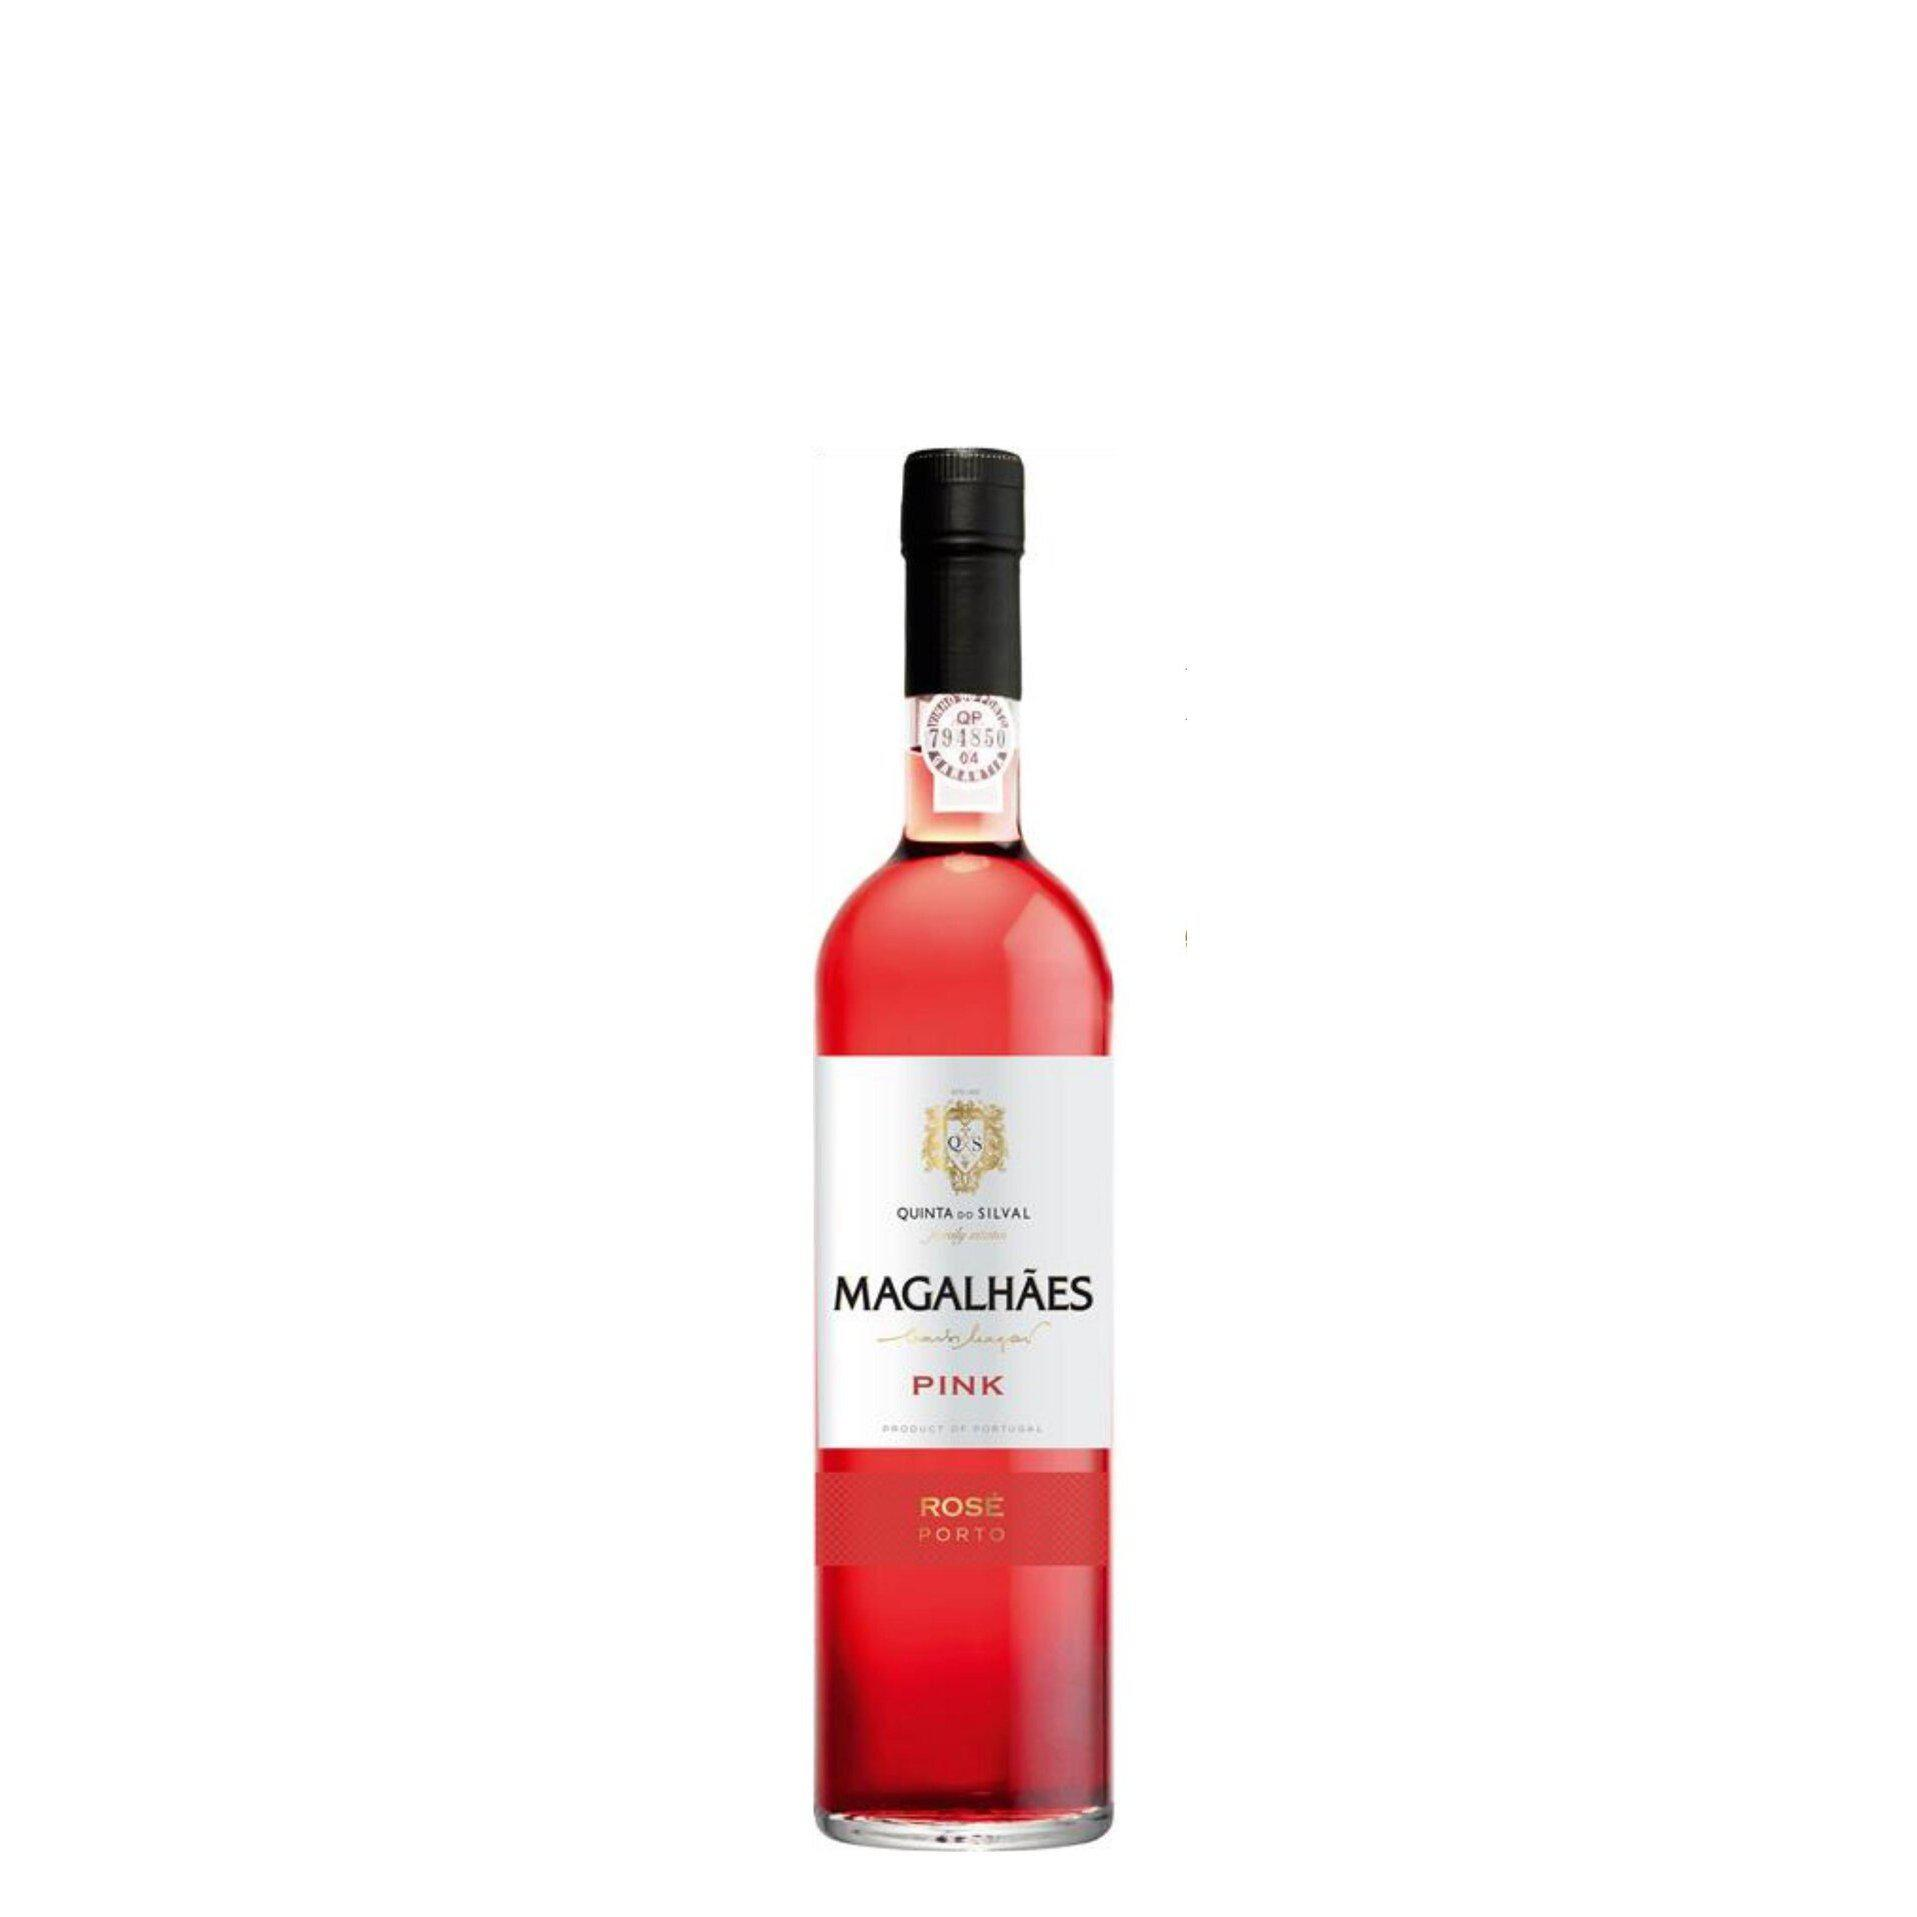 Magalhaes – Pink Port